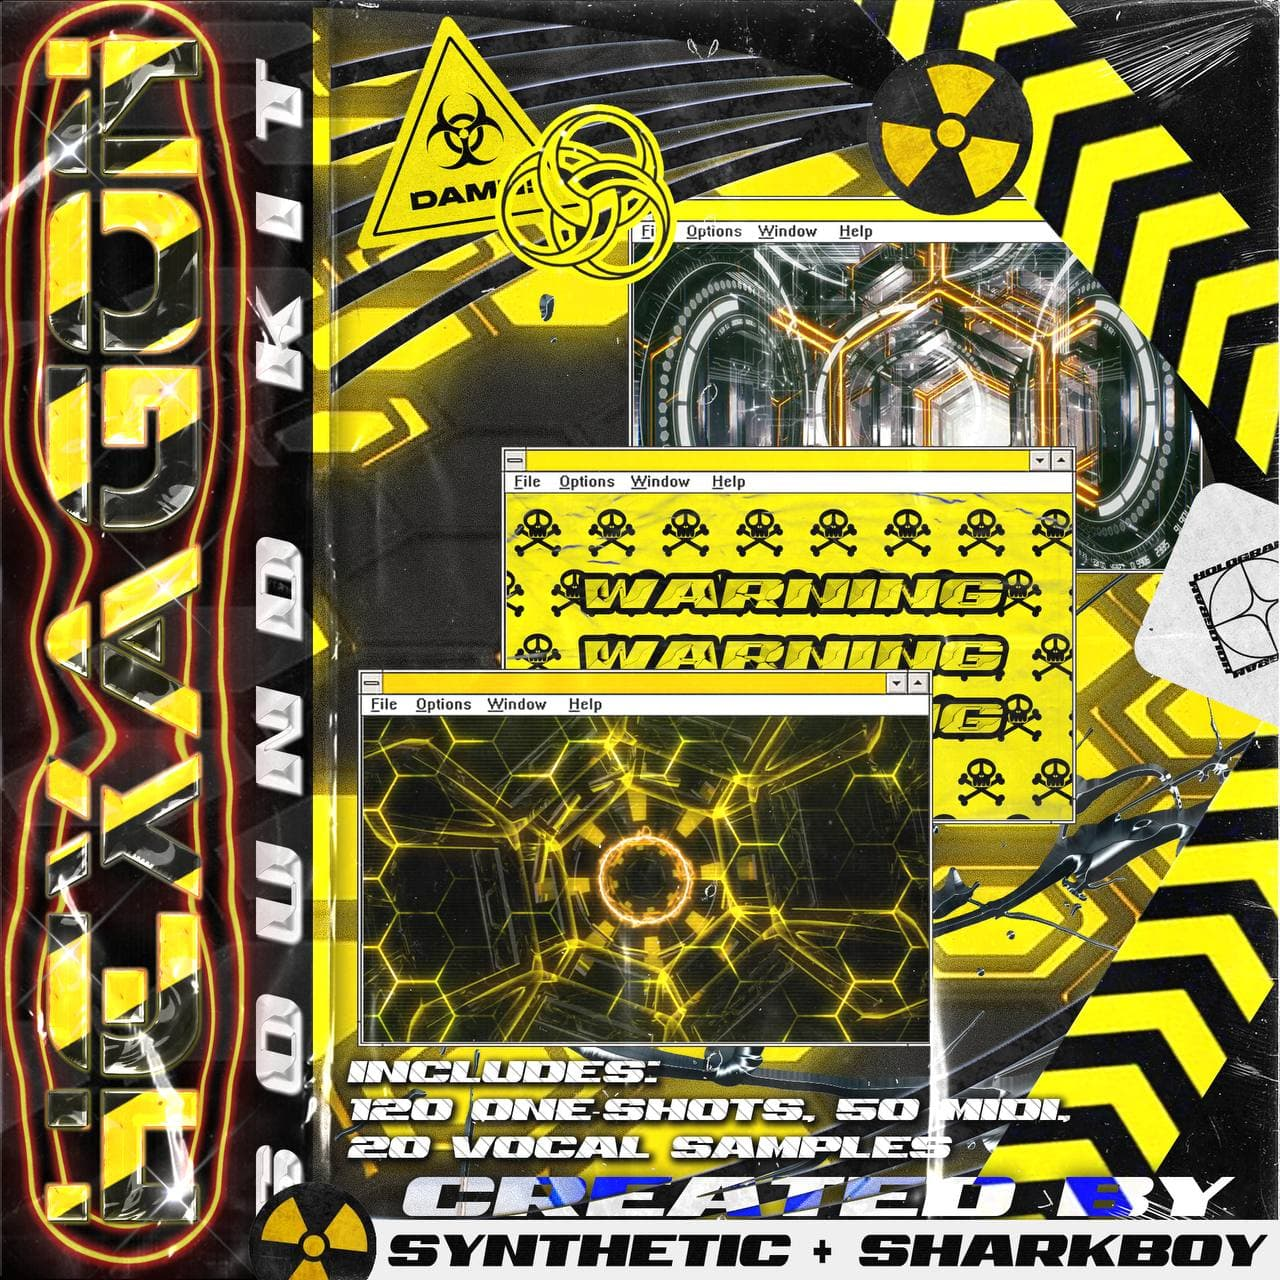 Synthetic x sharkboy - Hexagon Sound Kit